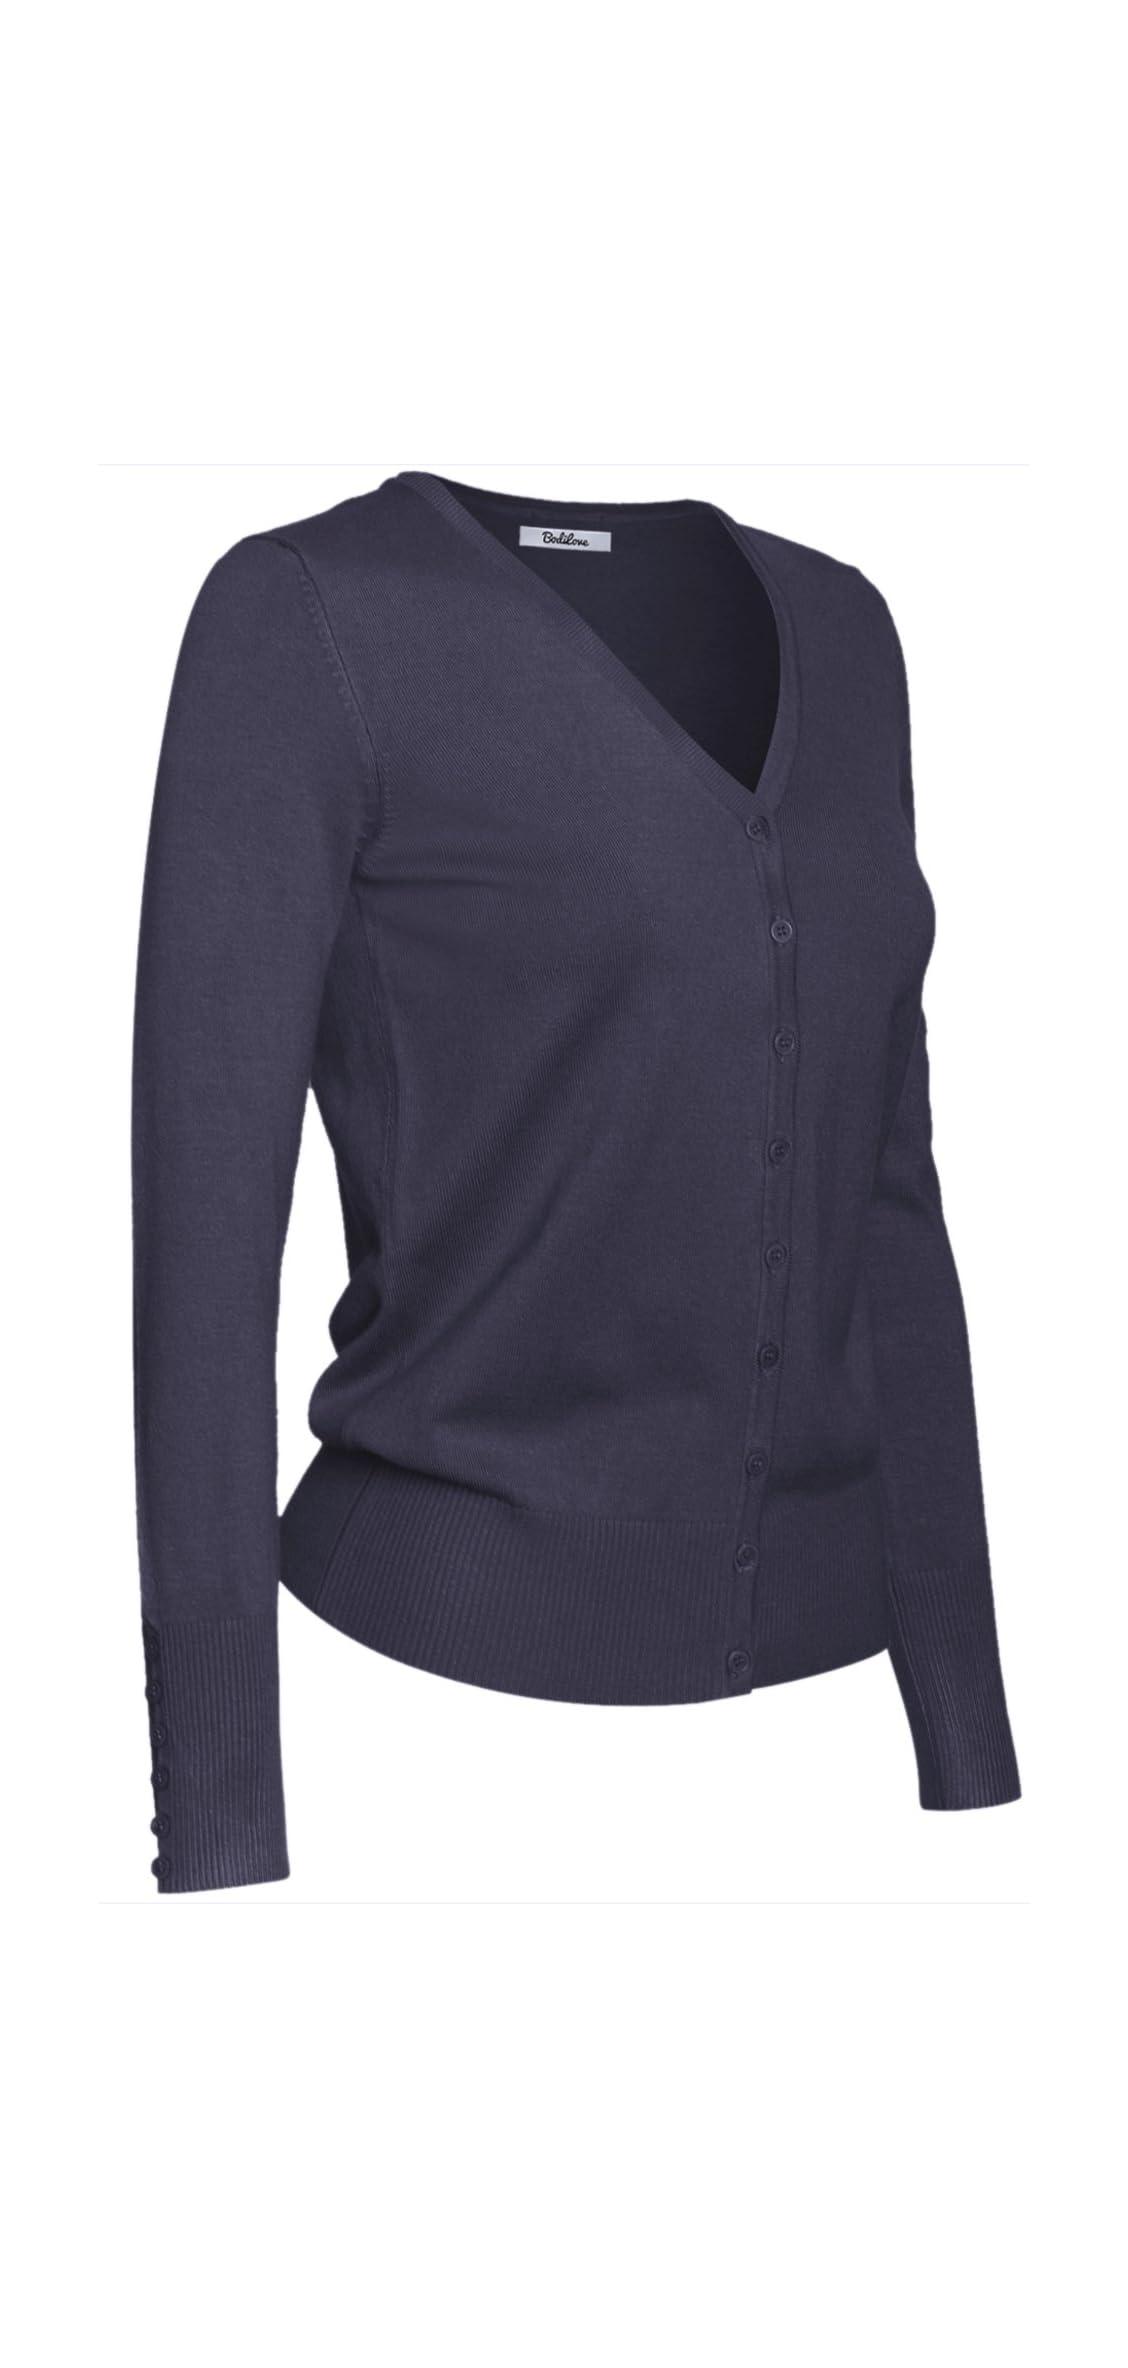 Women's Slub Twisted Back Open Plus Size Cardigan